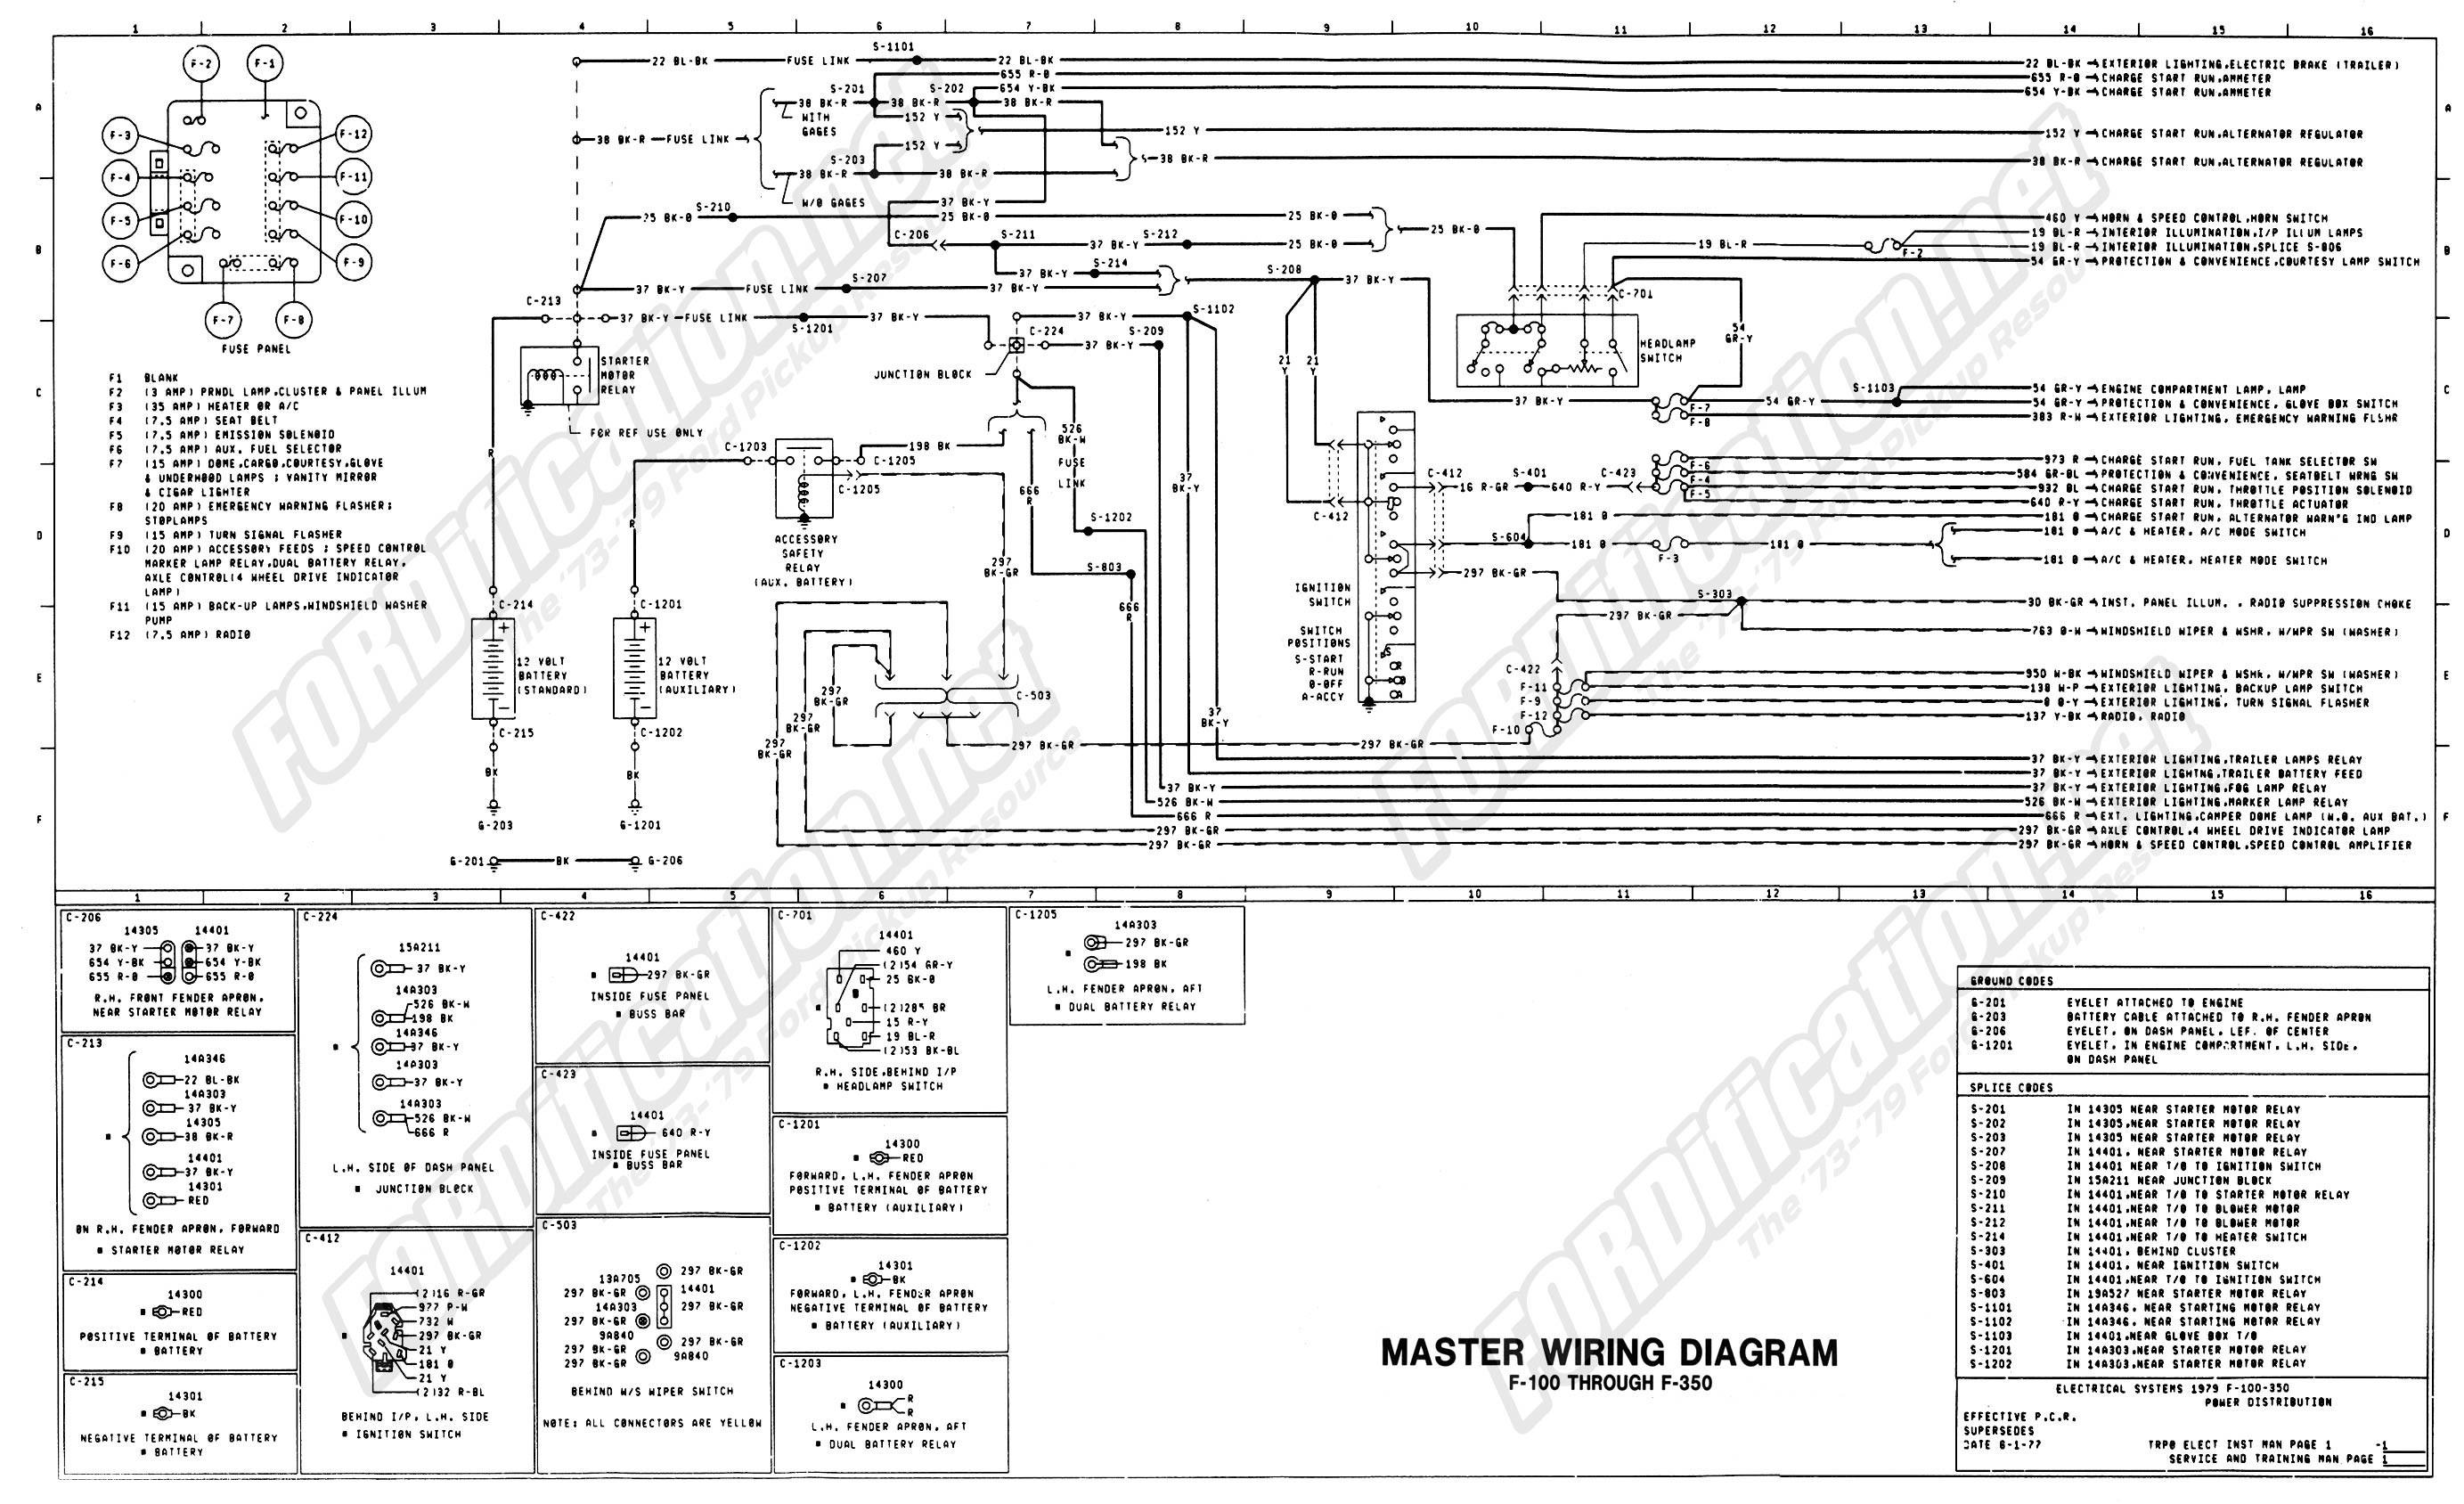 1996 mack fuse box diagram fa 3479  home 1999 ford windstar van fuse box diagram download diagram  1999 ford windstar van fuse box diagram